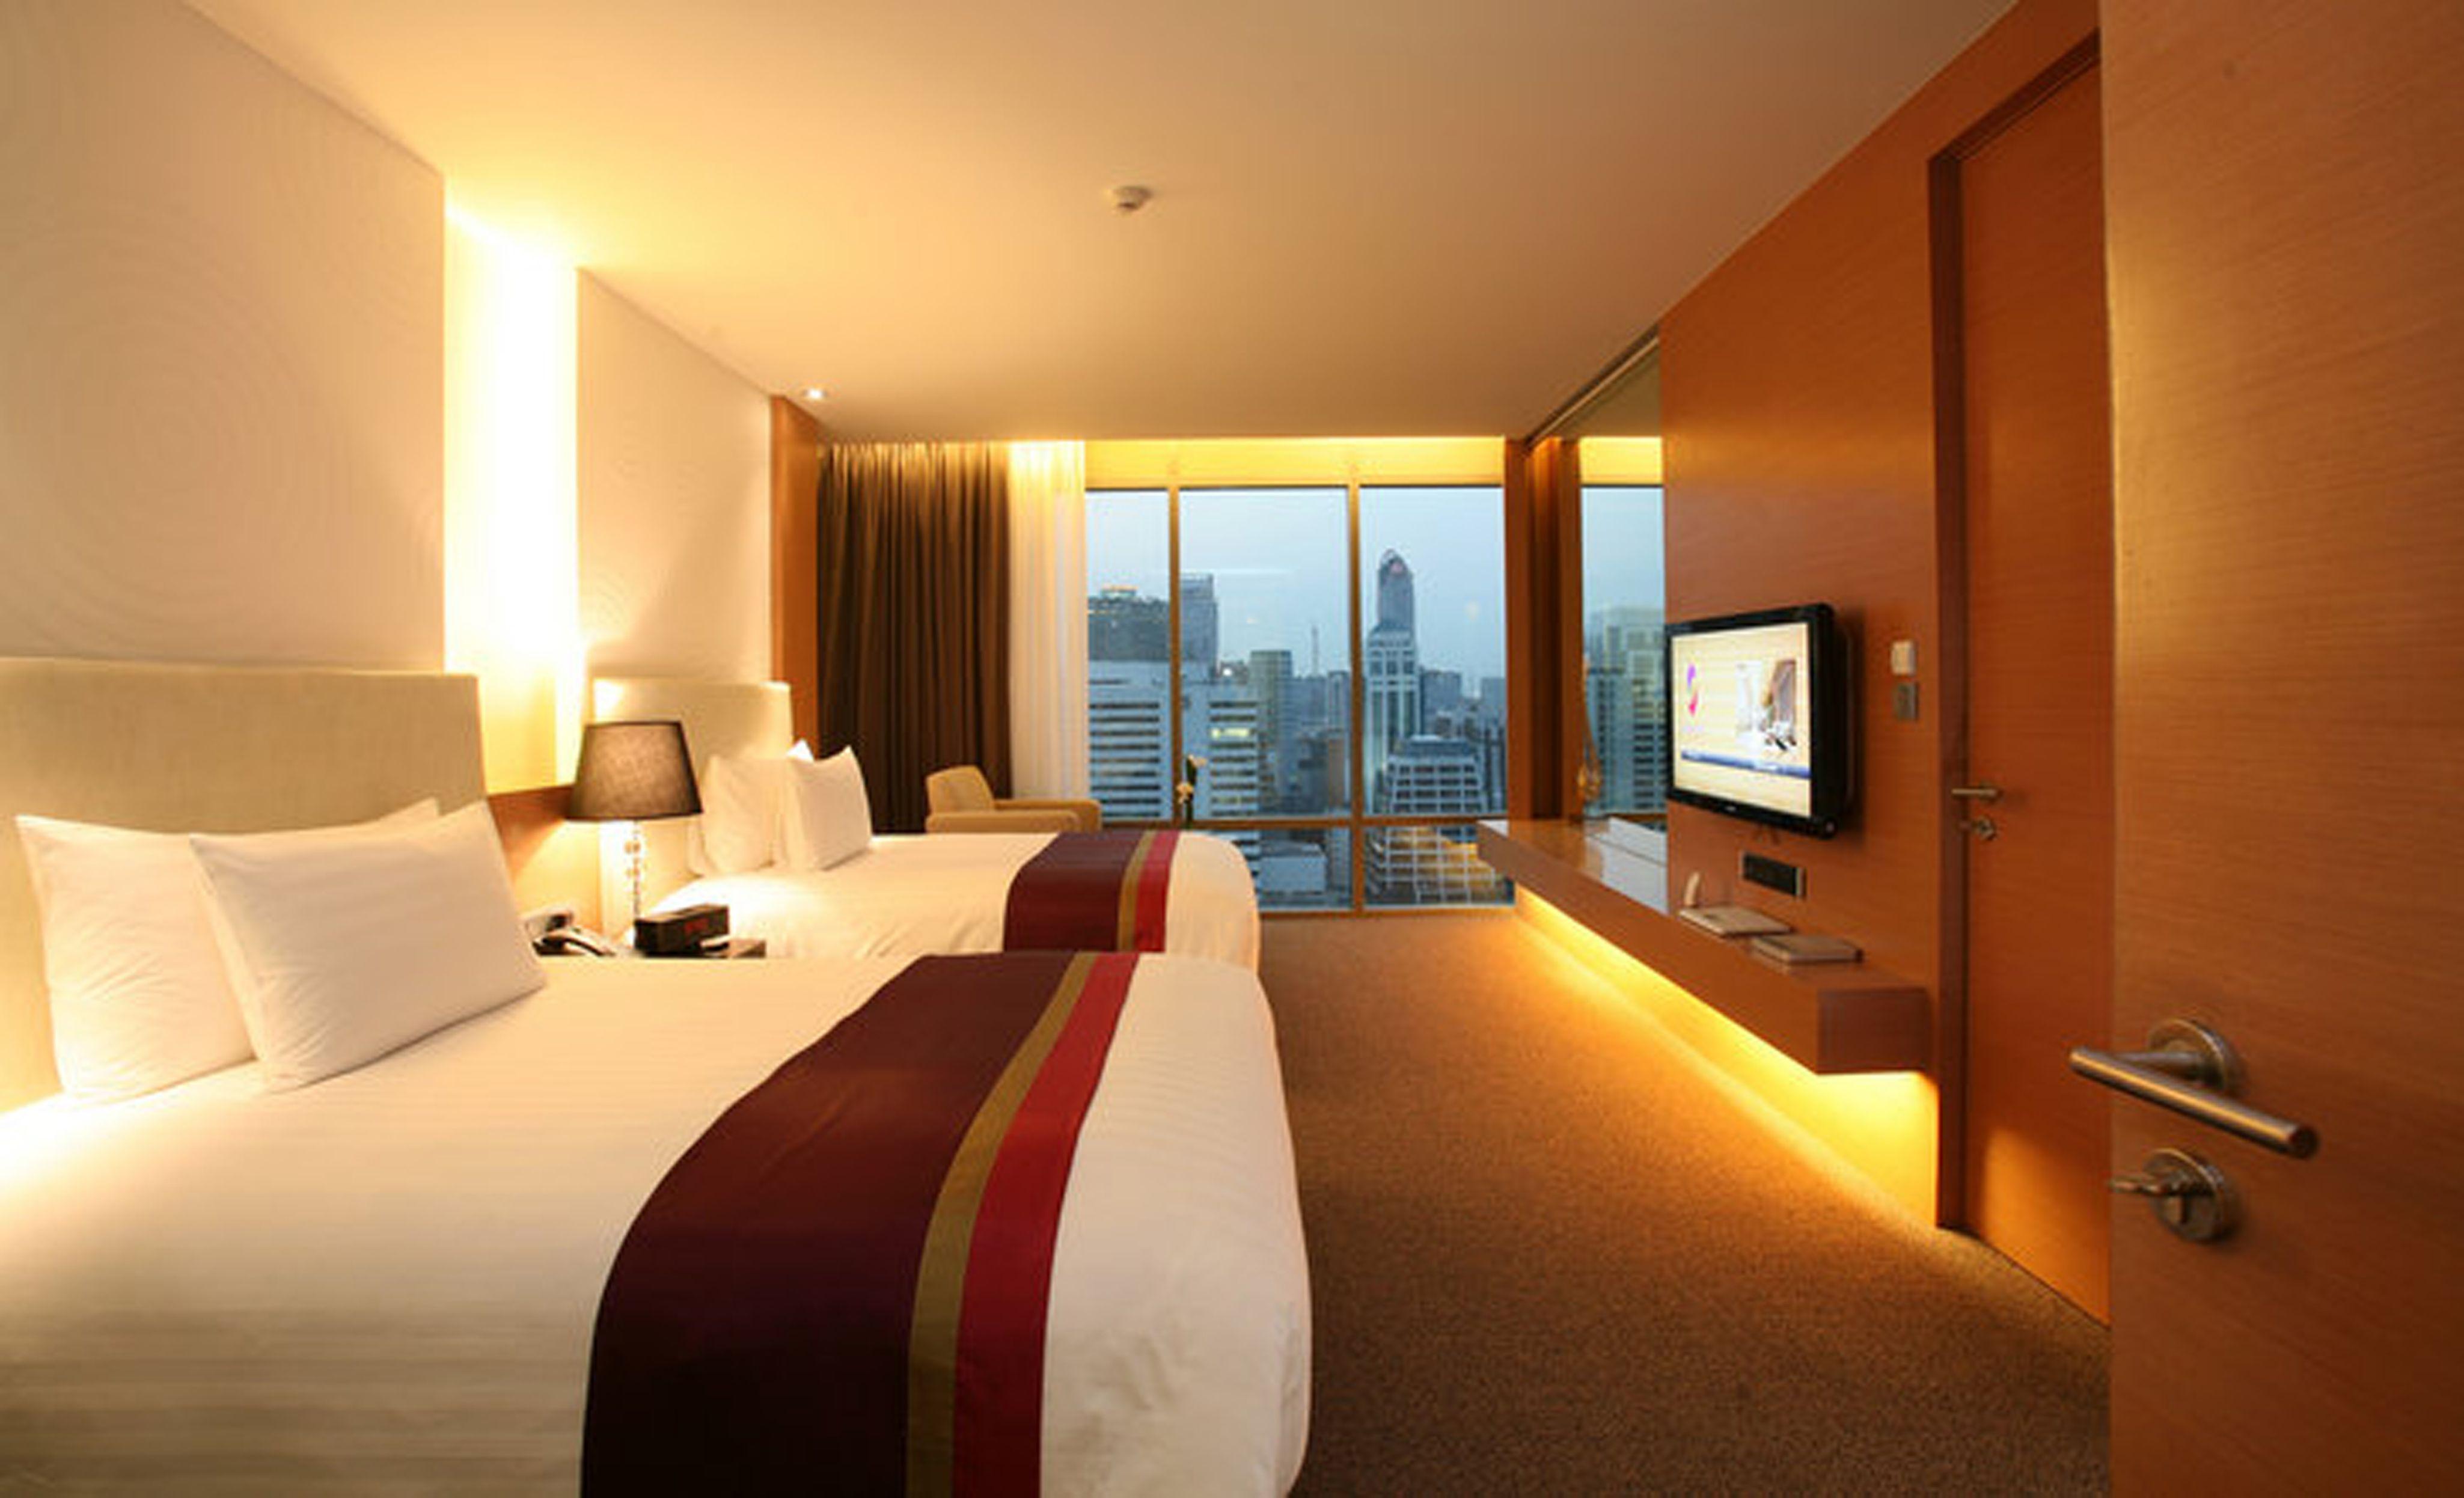 ideas to design a small bedroom interior design ideas for bedrooms mens bedroom design ideas #Bedrooms